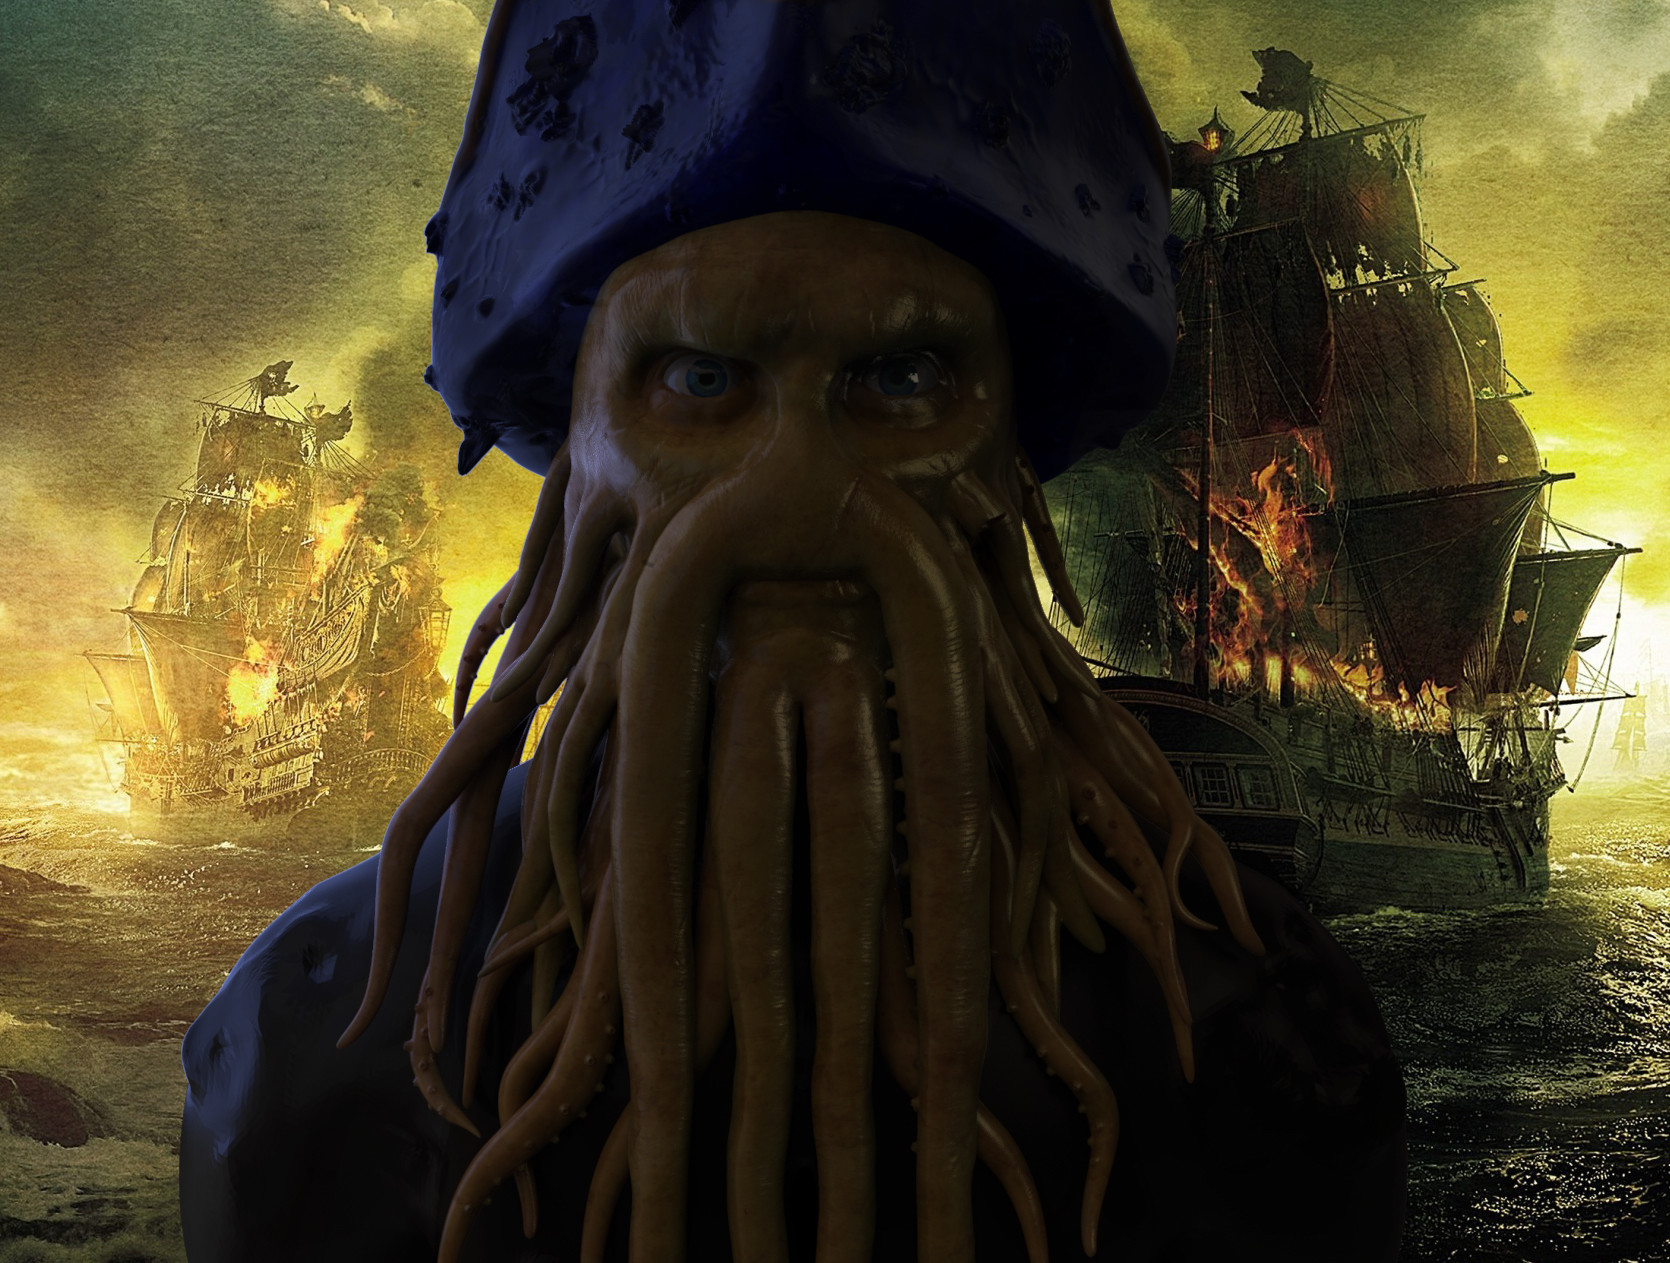 ArtStation - Pirates of the caribbean Davy jones , Chero